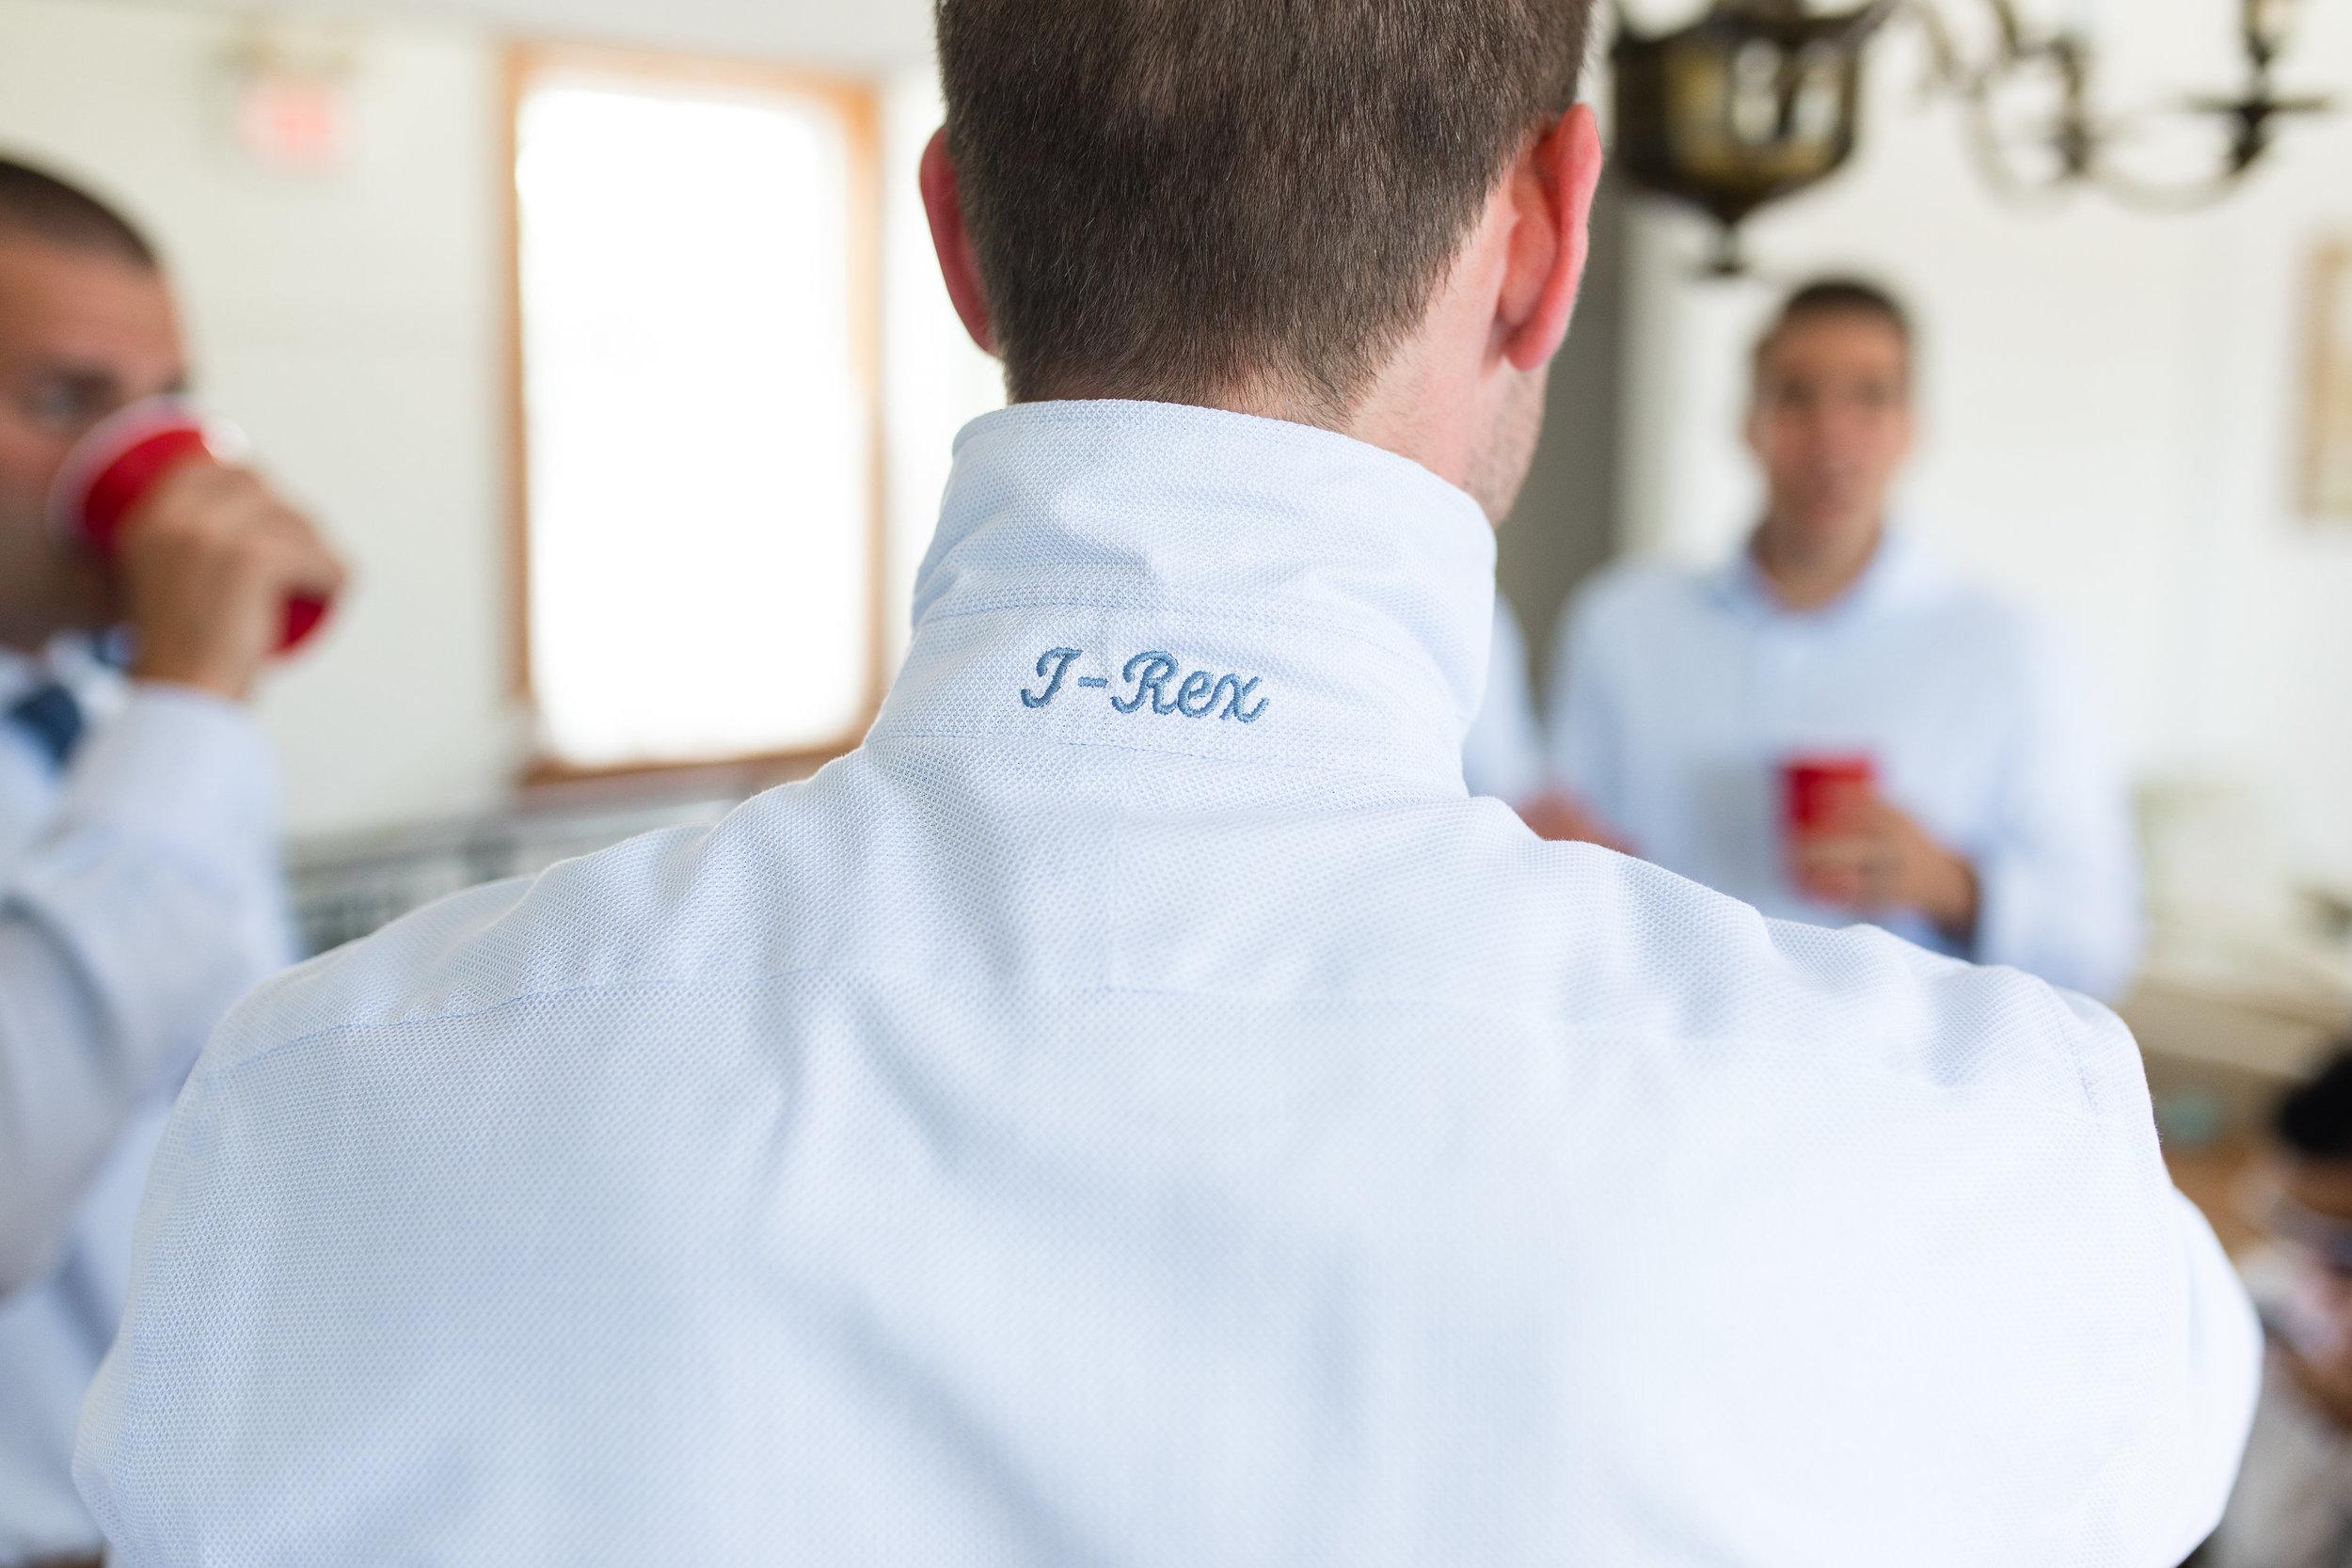 Beaufort SC Groom's monogrammed shirt  //  Hilton Head wedding photos by Garter + Whiskey